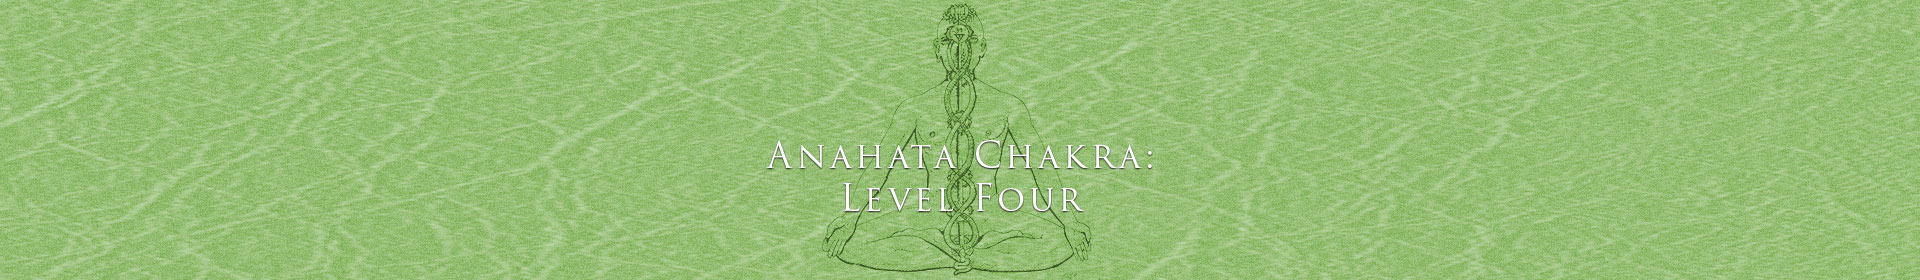 Anahata Chakra: Level Four